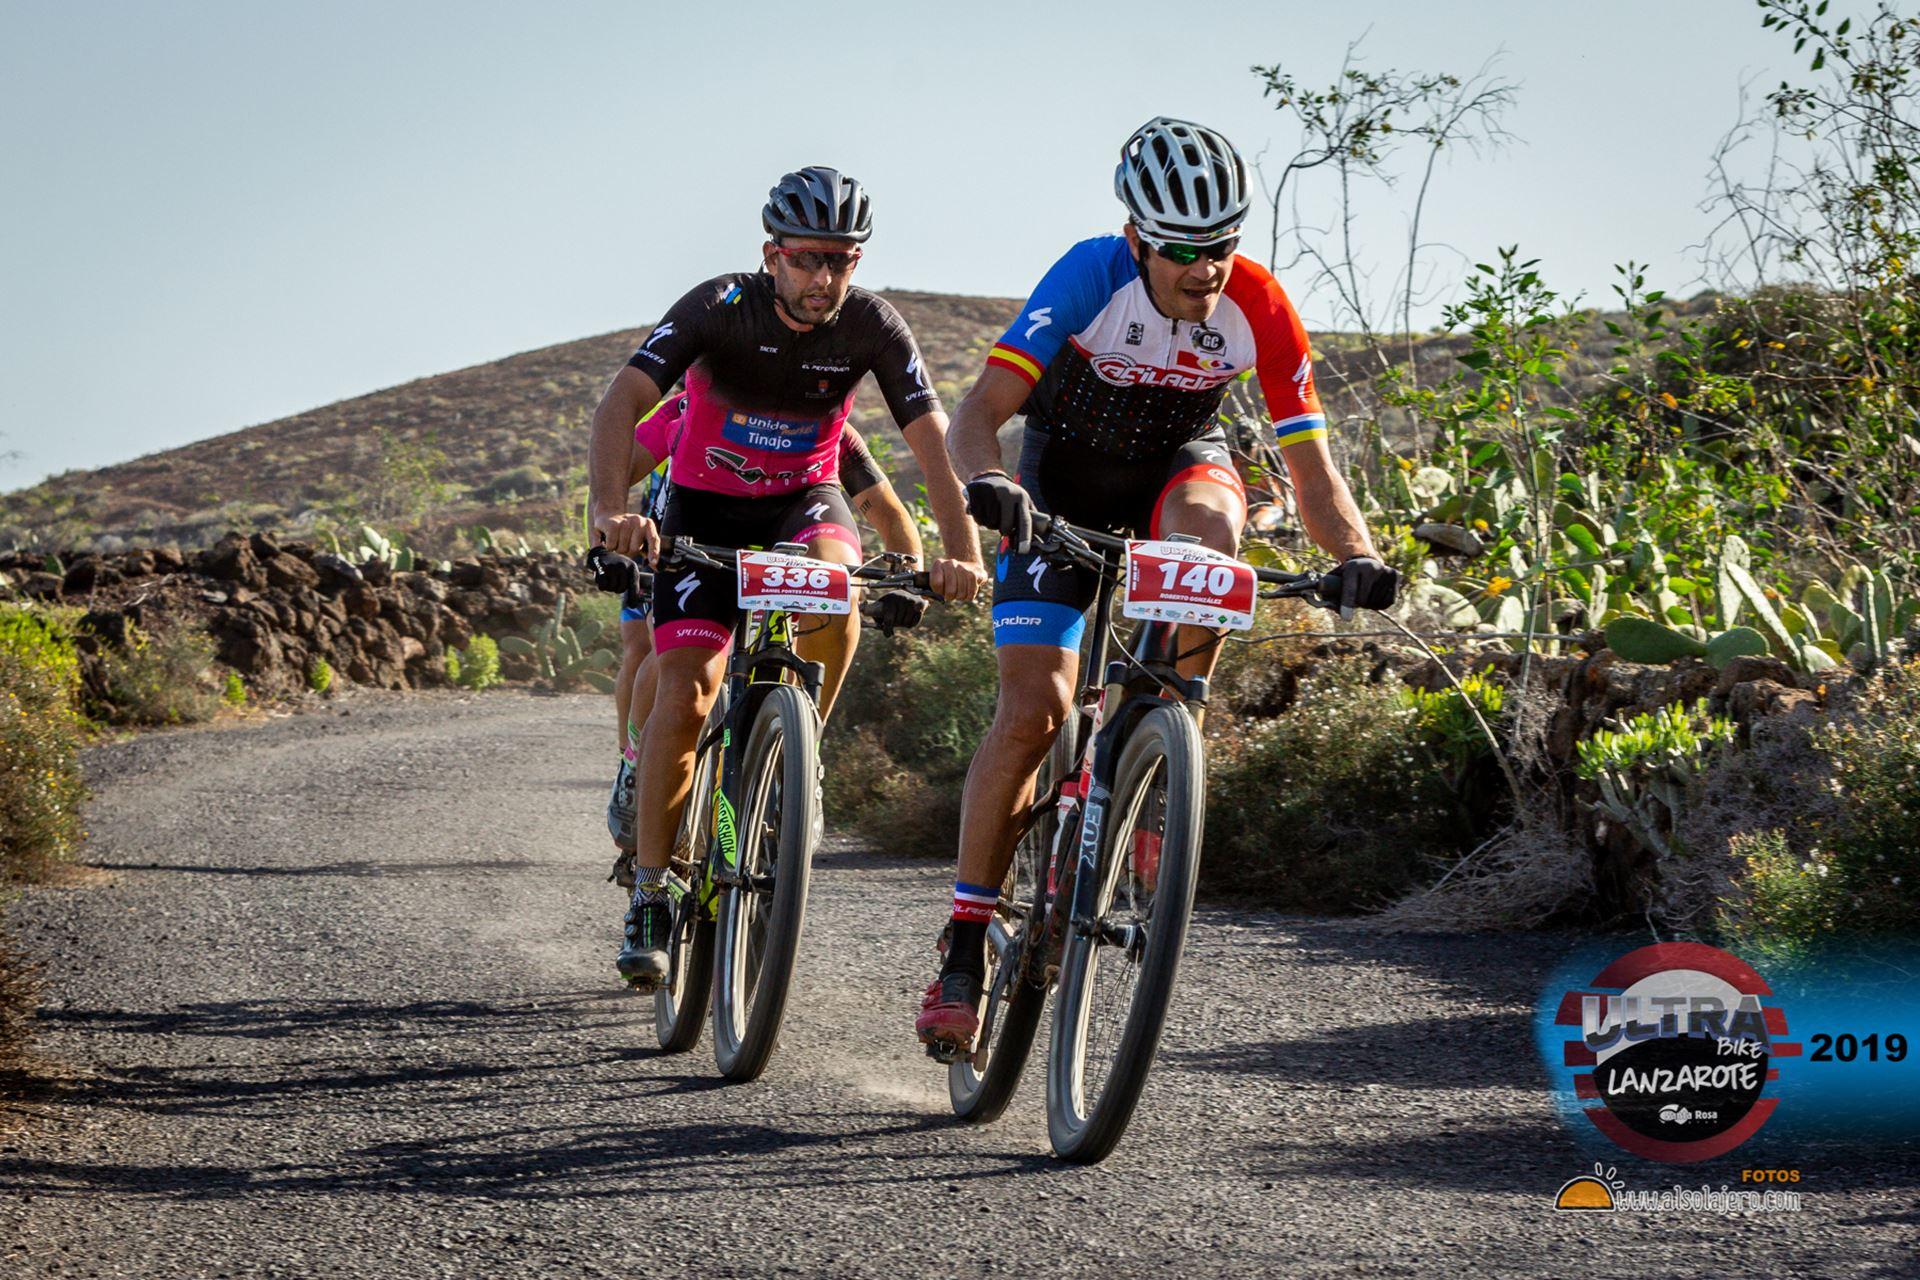 Sector Guatiza 2ª Etapa Ultrabike 2019 Fotos Alsolajero.com-26